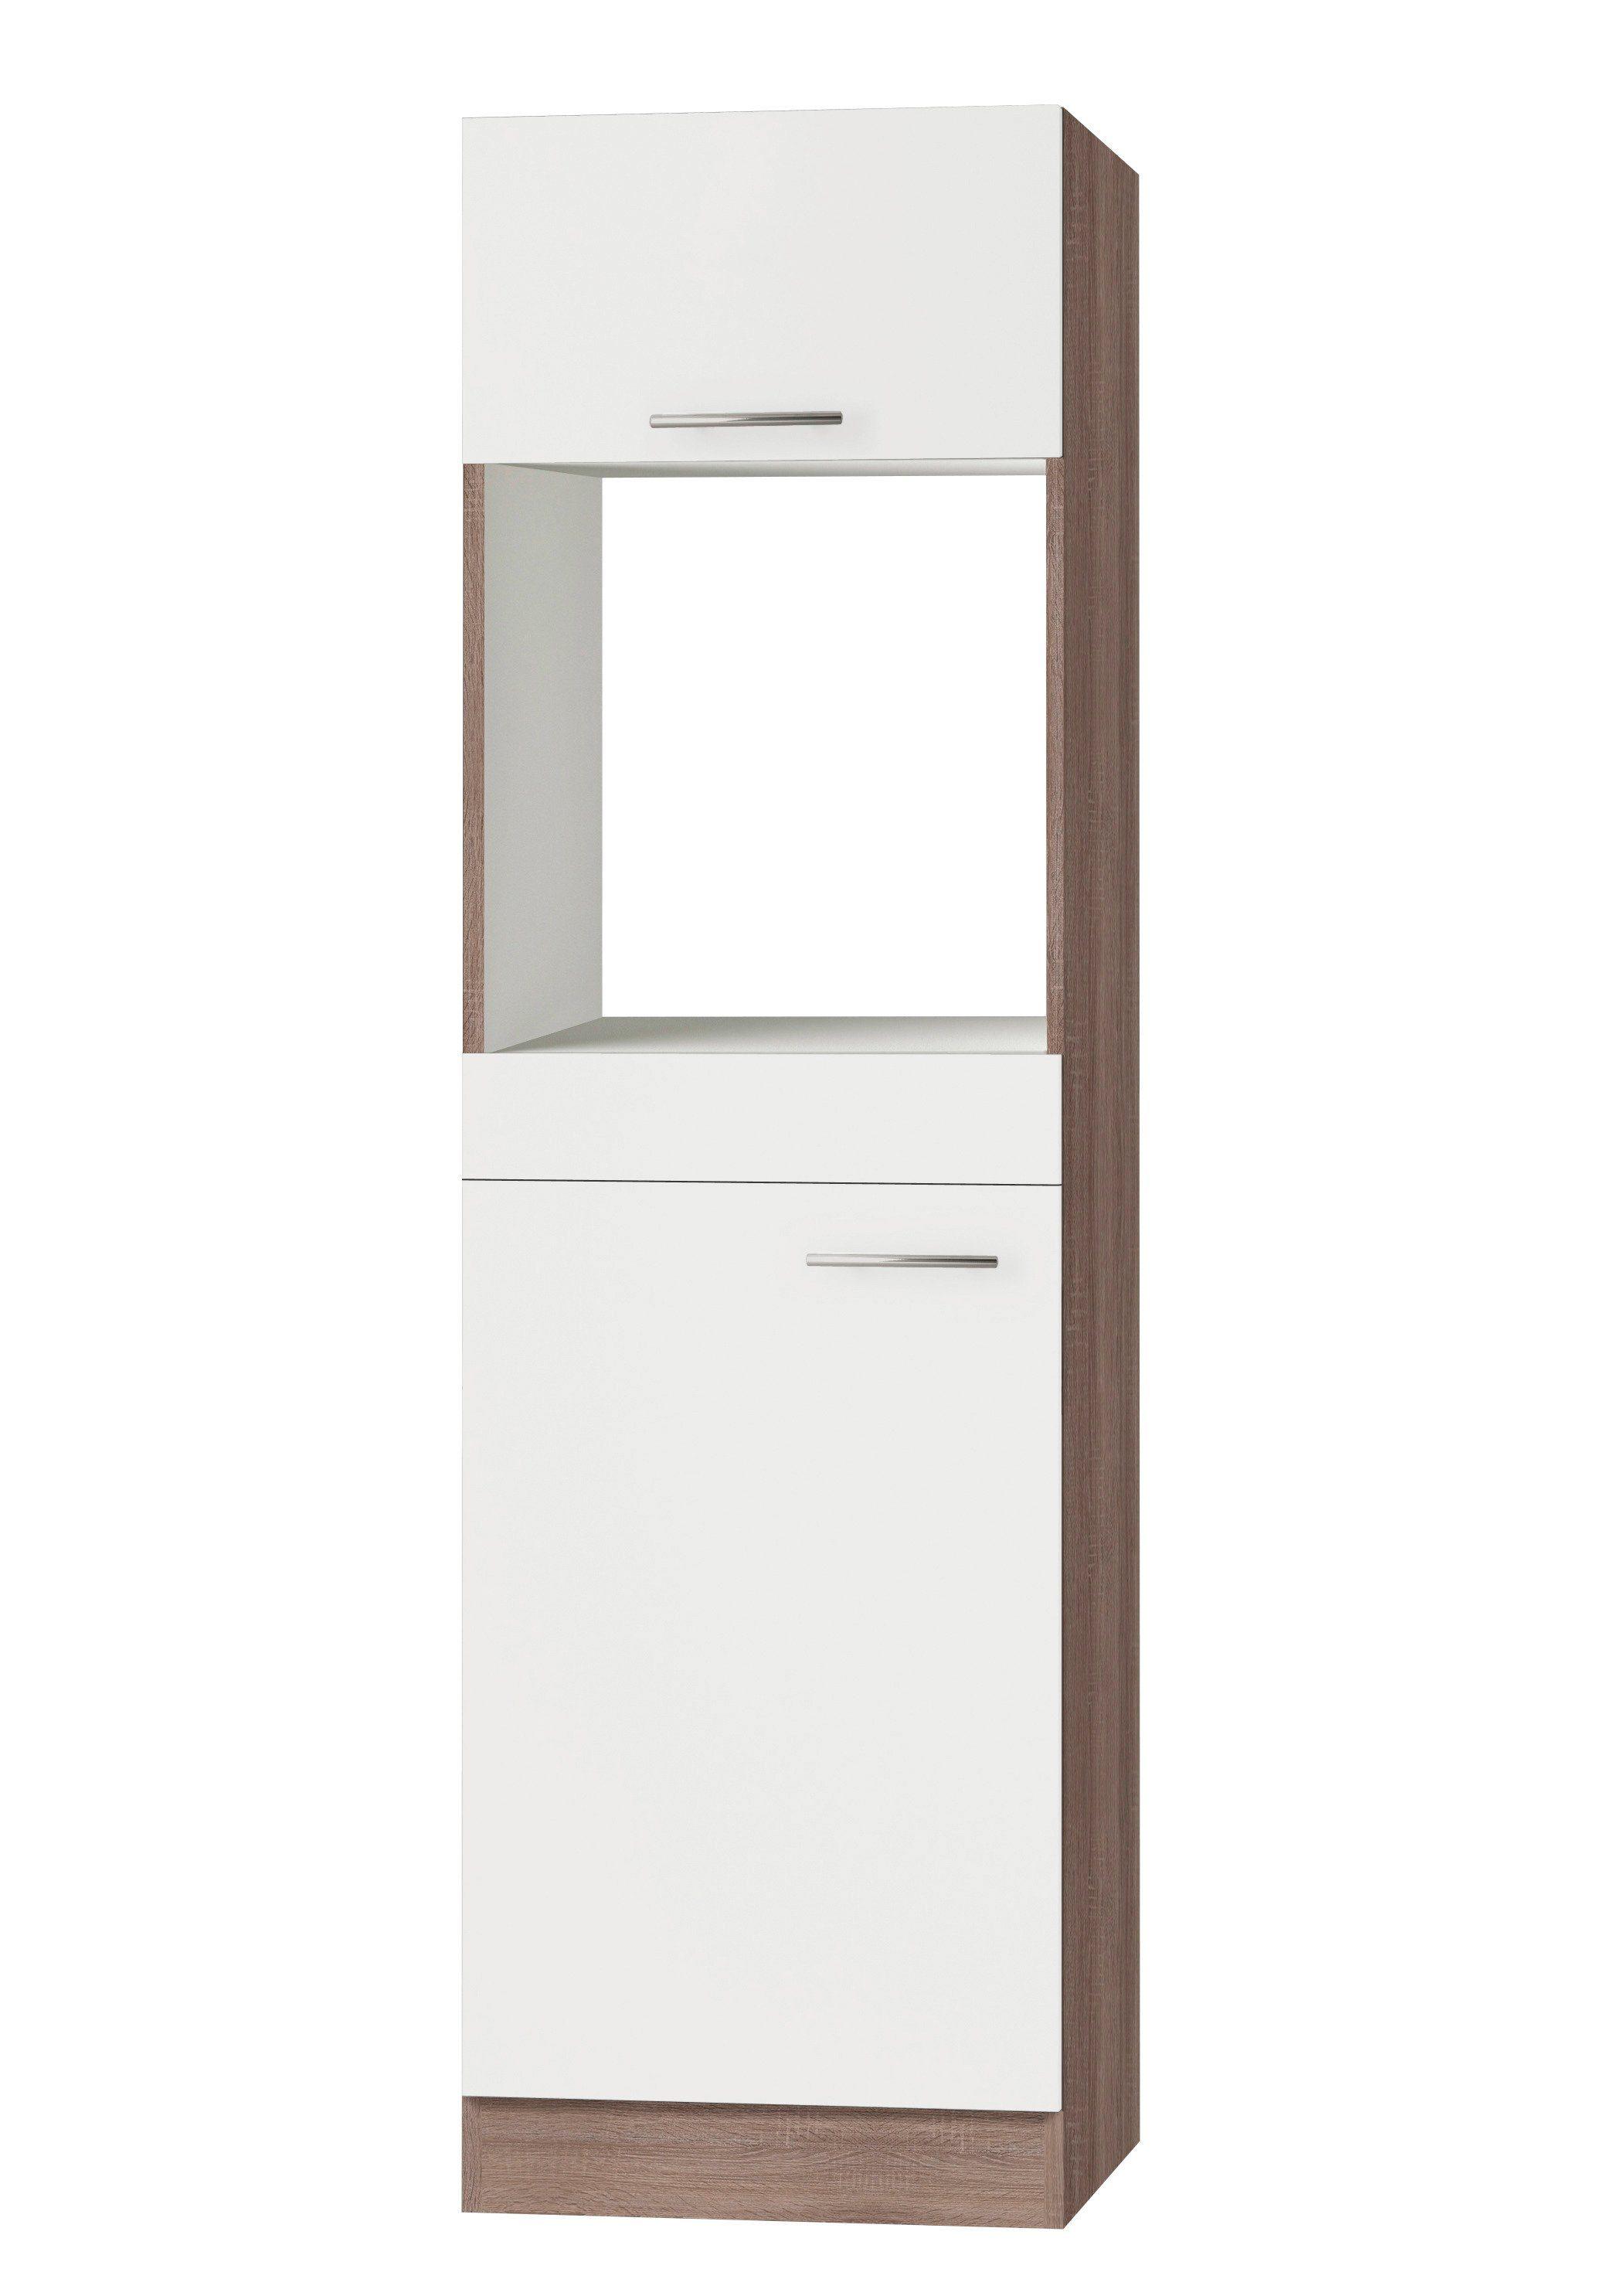 Optifit Kombinierter Backofen-Kühlumbauschrank »Rabat«, Höhe 206,8 cm